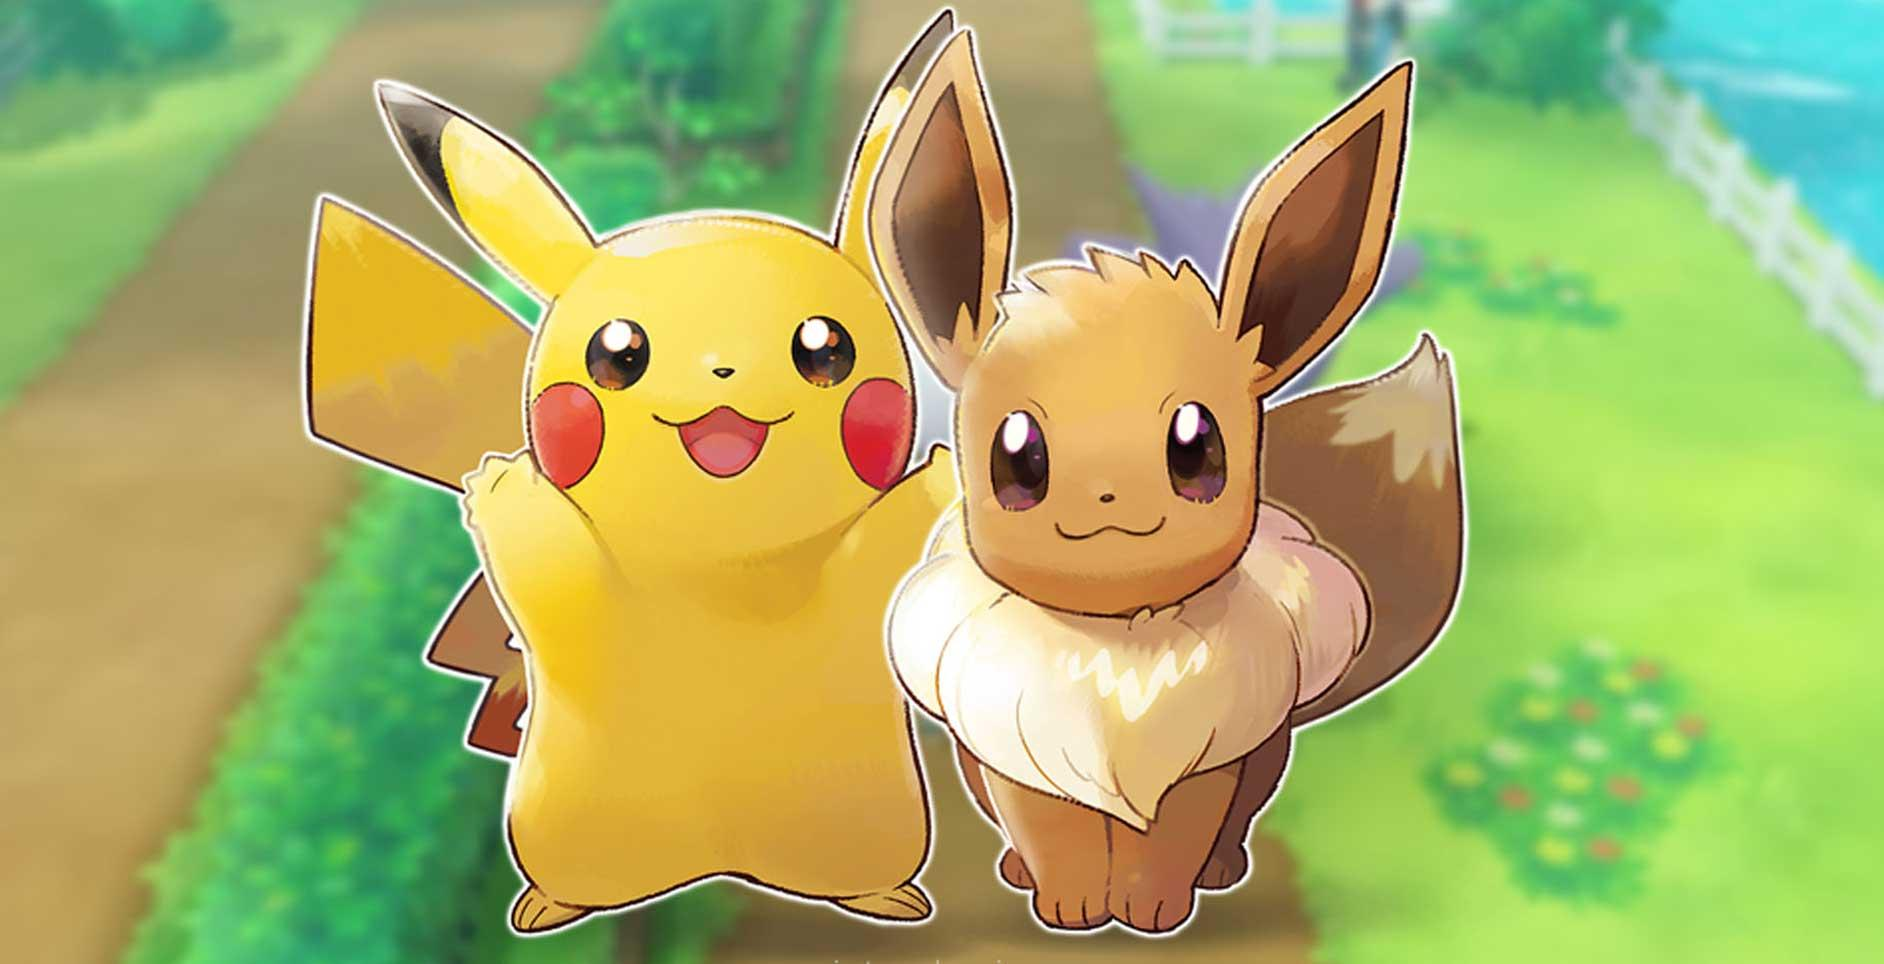 [CANCELLED] Pokémon Club